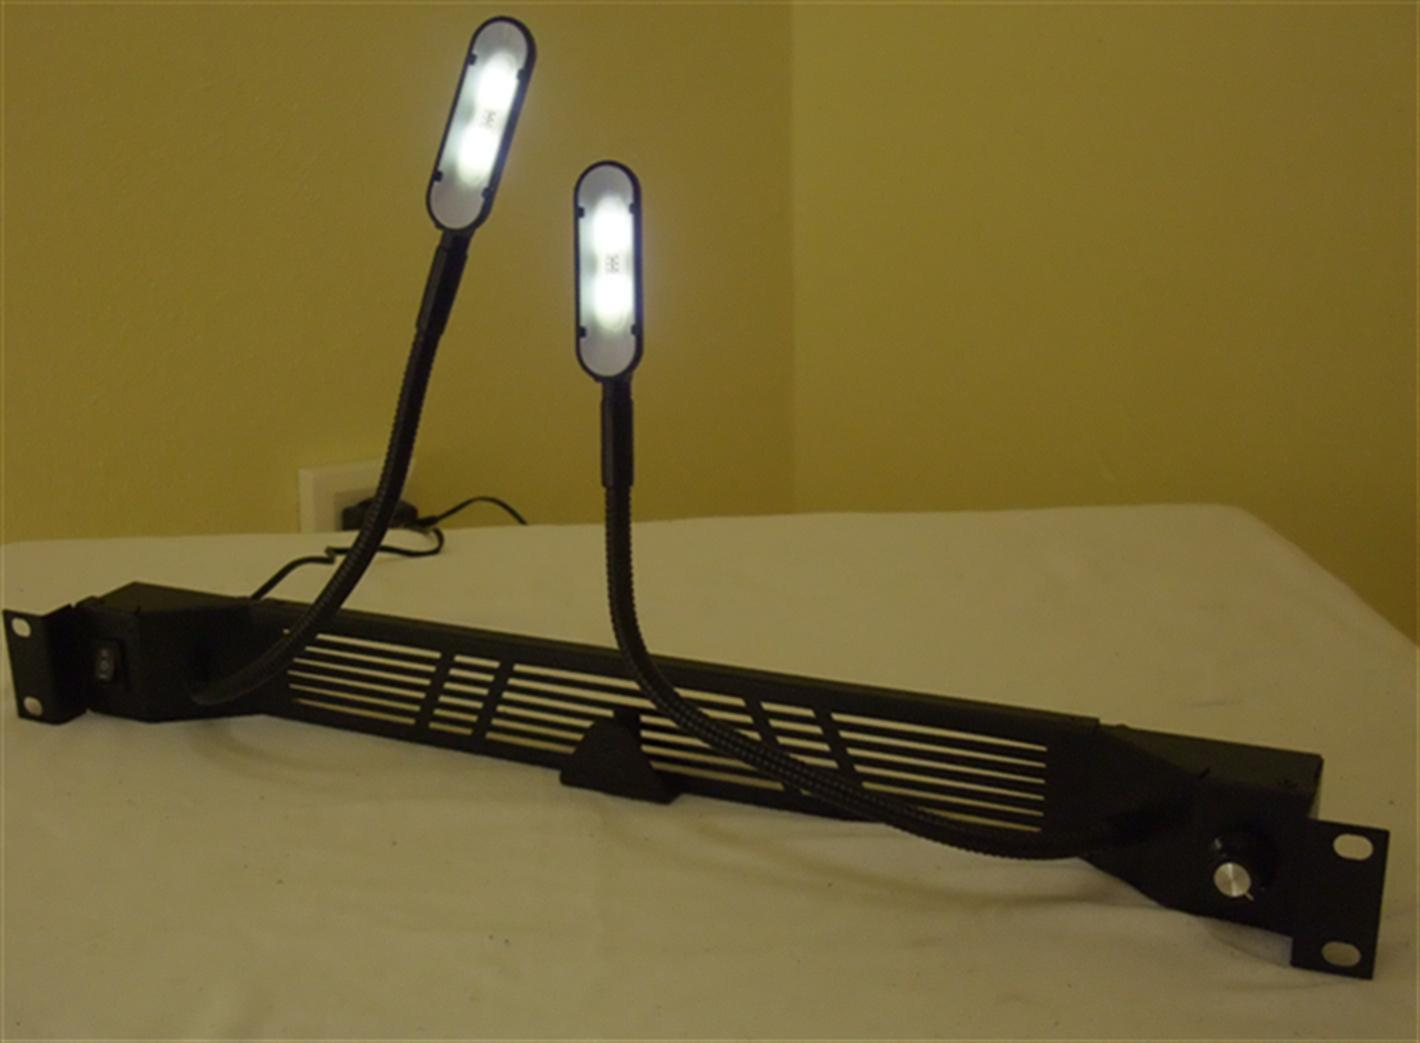 2 fach led schwanenhals racklampe wei es blaues licht rackbeleuchtung racklight. Black Bedroom Furniture Sets. Home Design Ideas